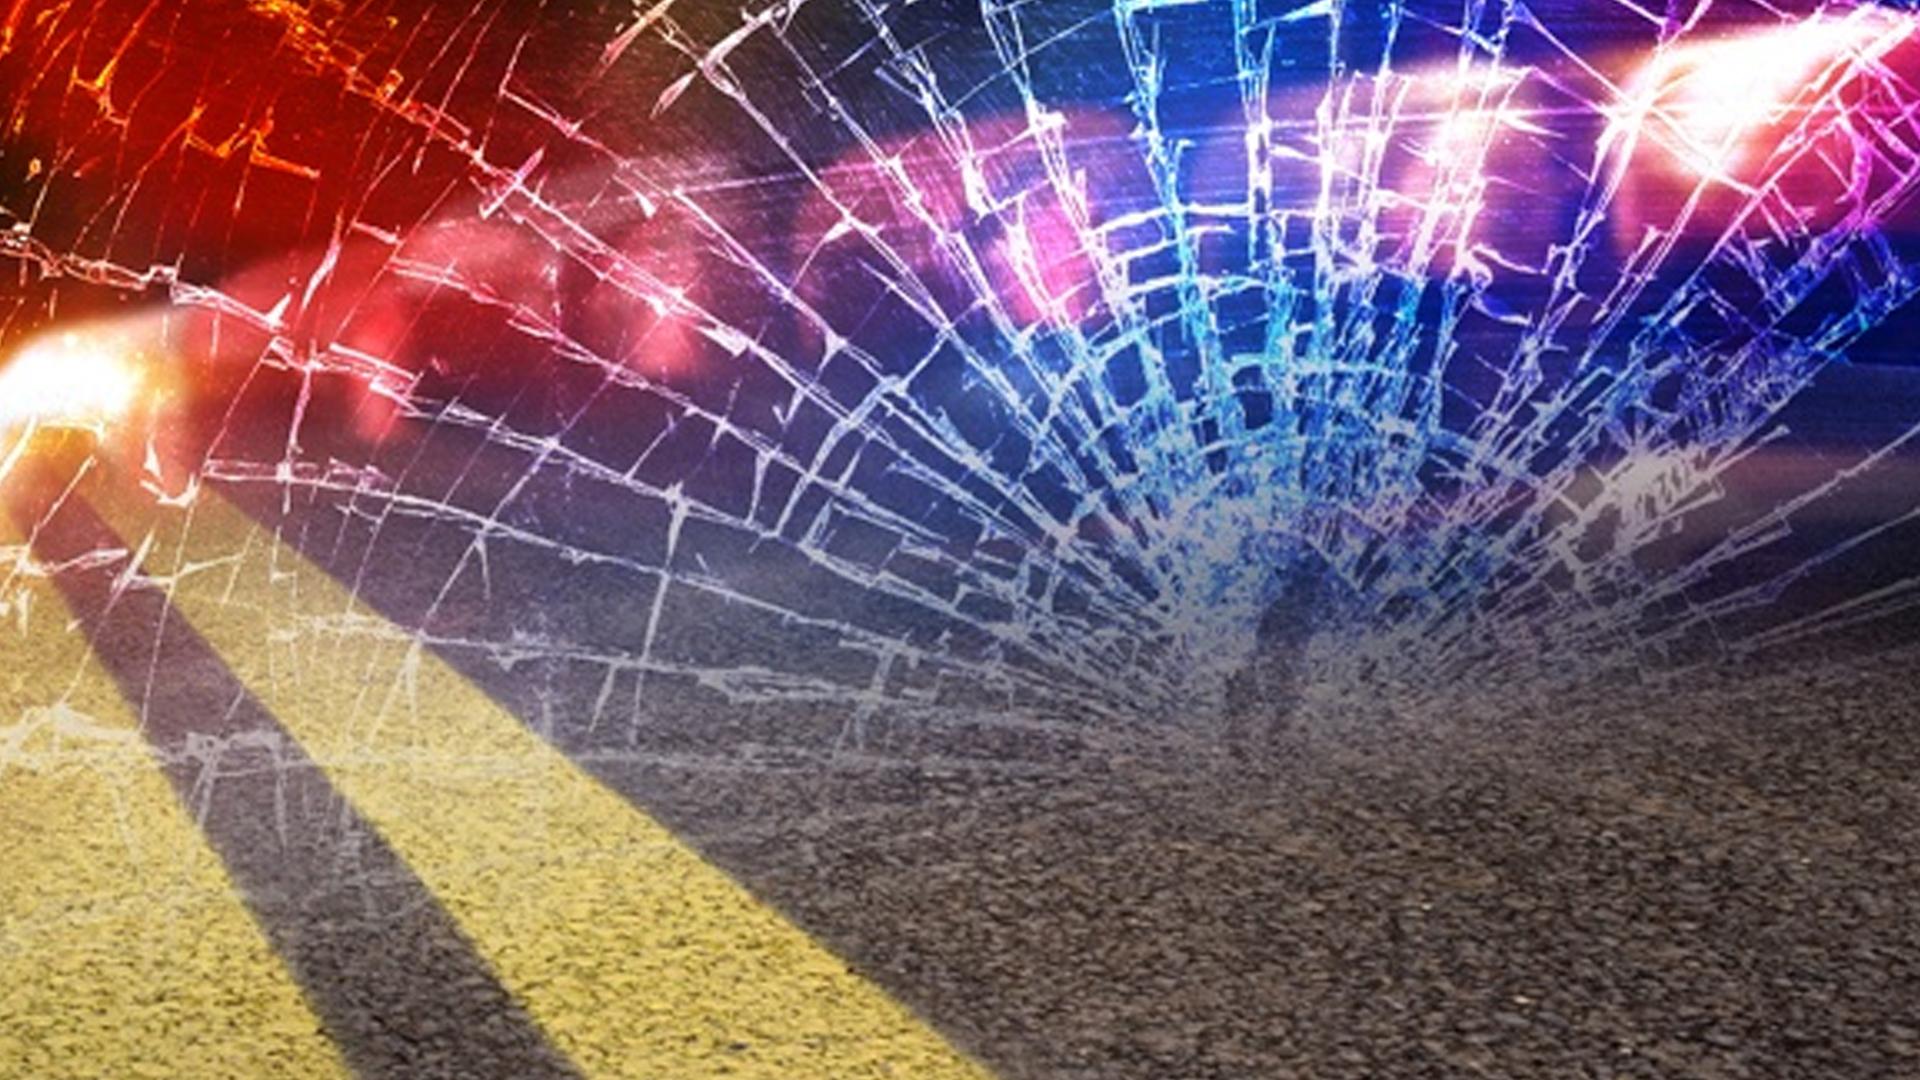 car accident_1459719258890.jpg